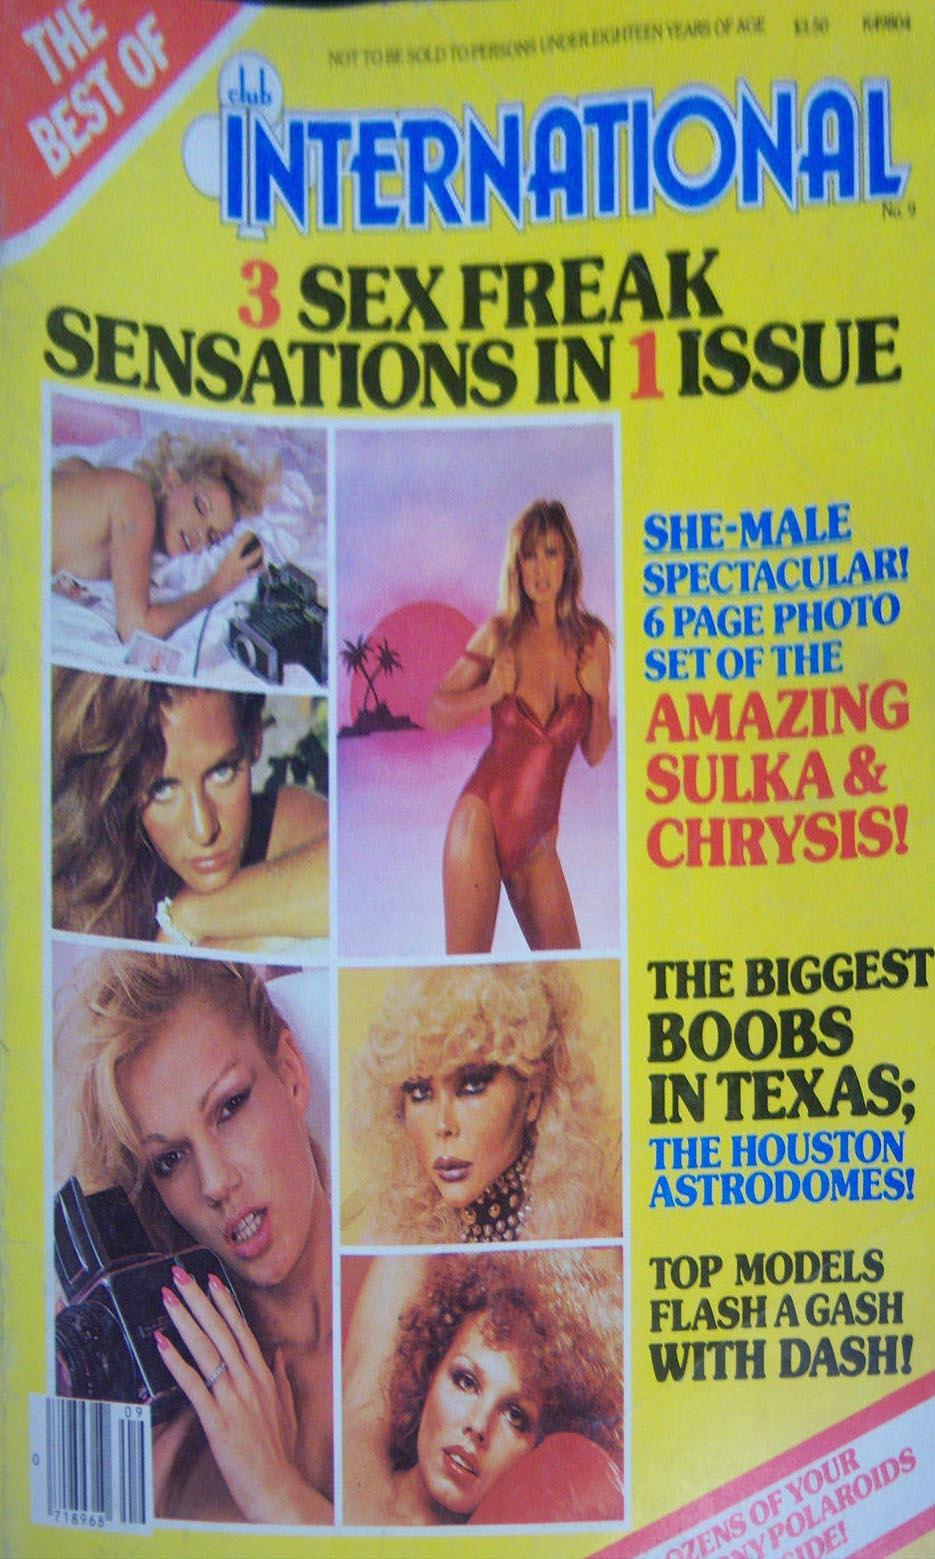 Best of Club International # 9 magazine back issue Best of Club International magizine back copy